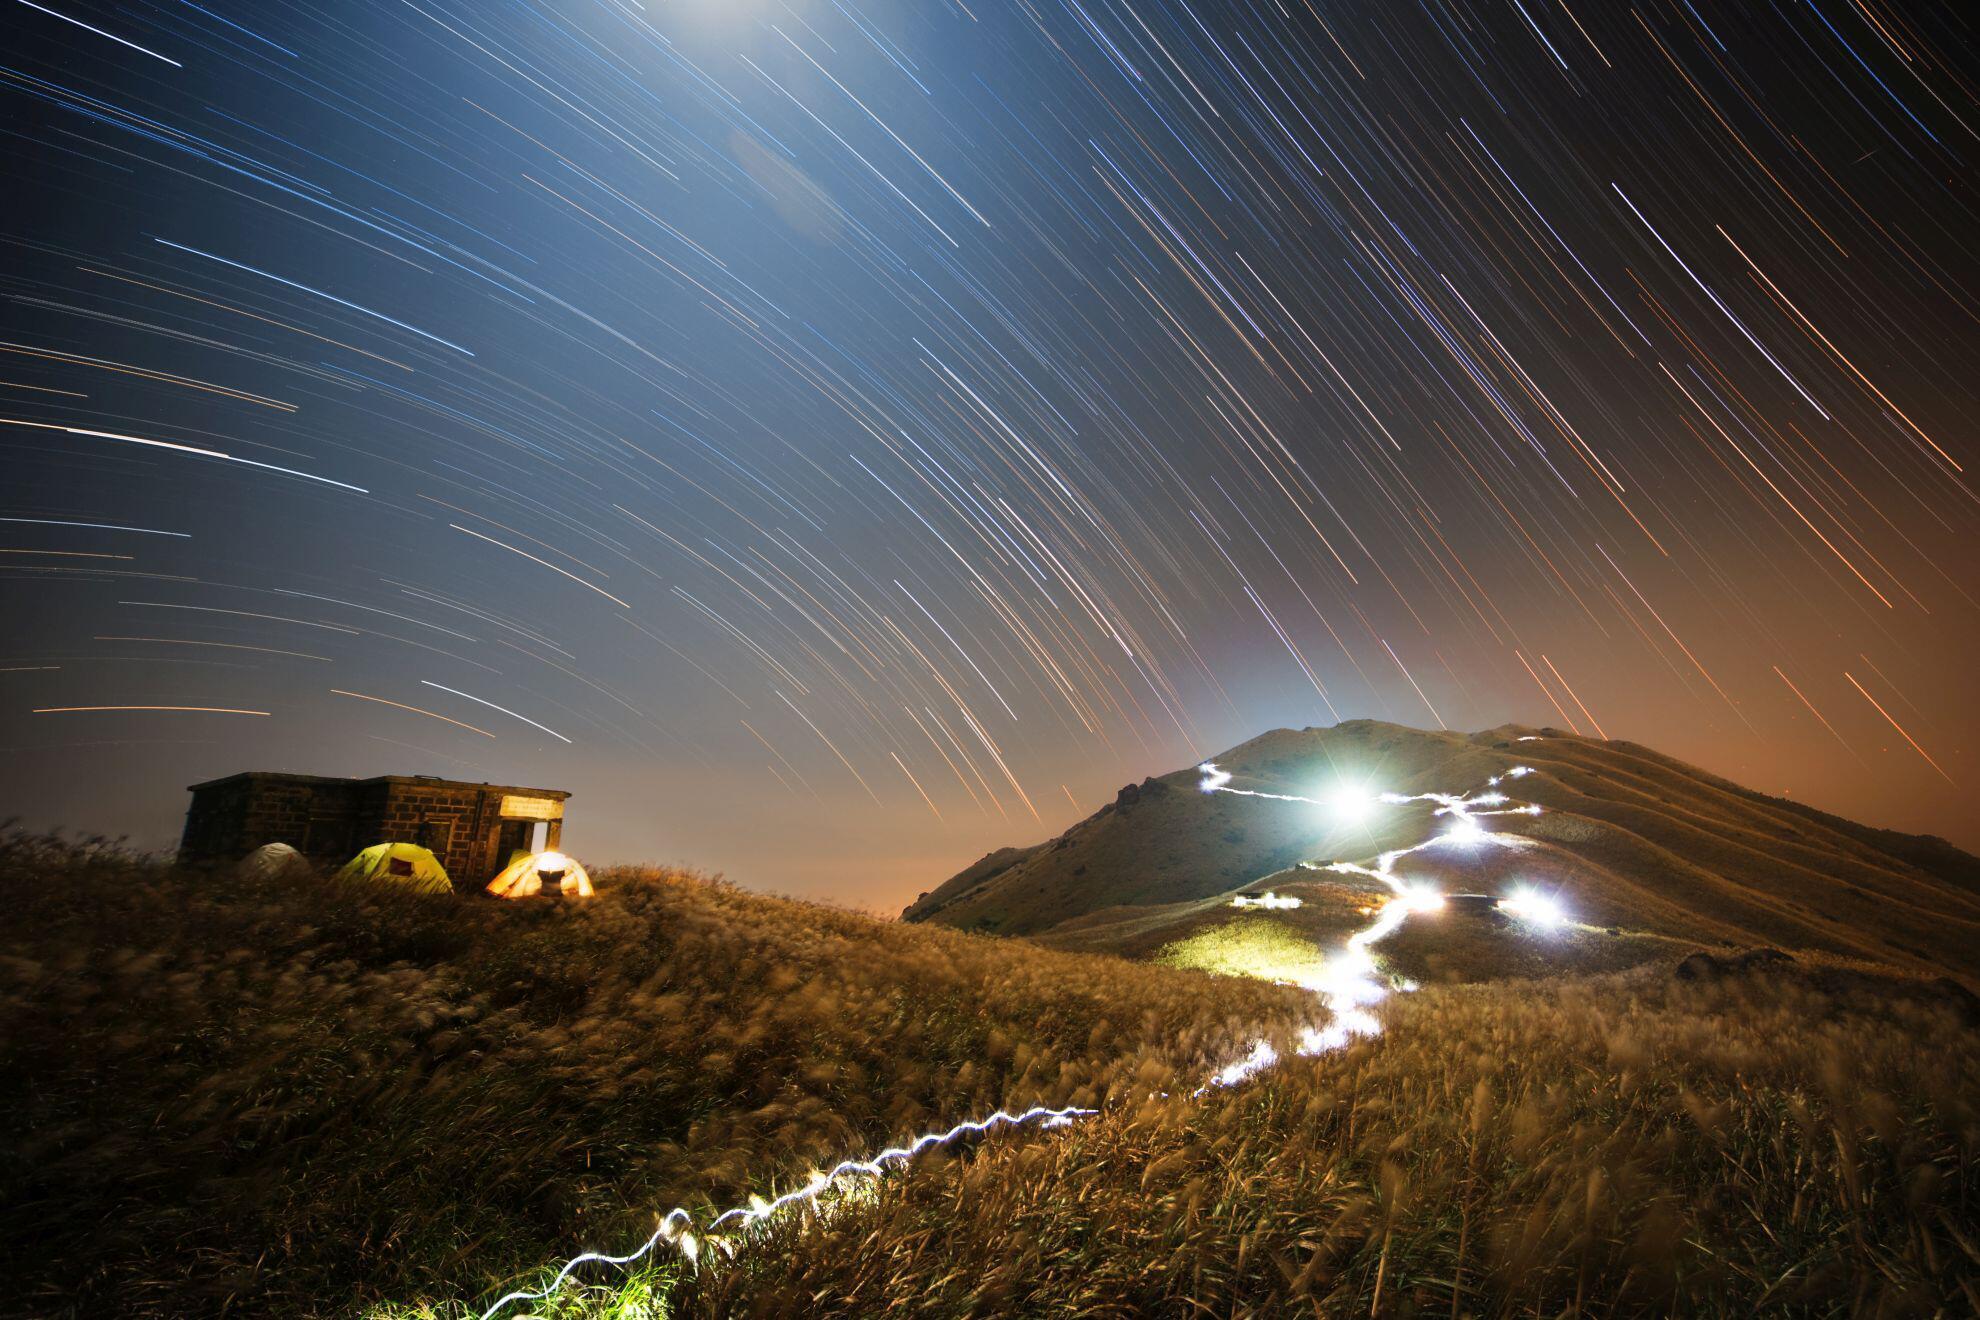 Bild zu Chap Him Wong (Hong Kong) with Sunset Peak Star Trail